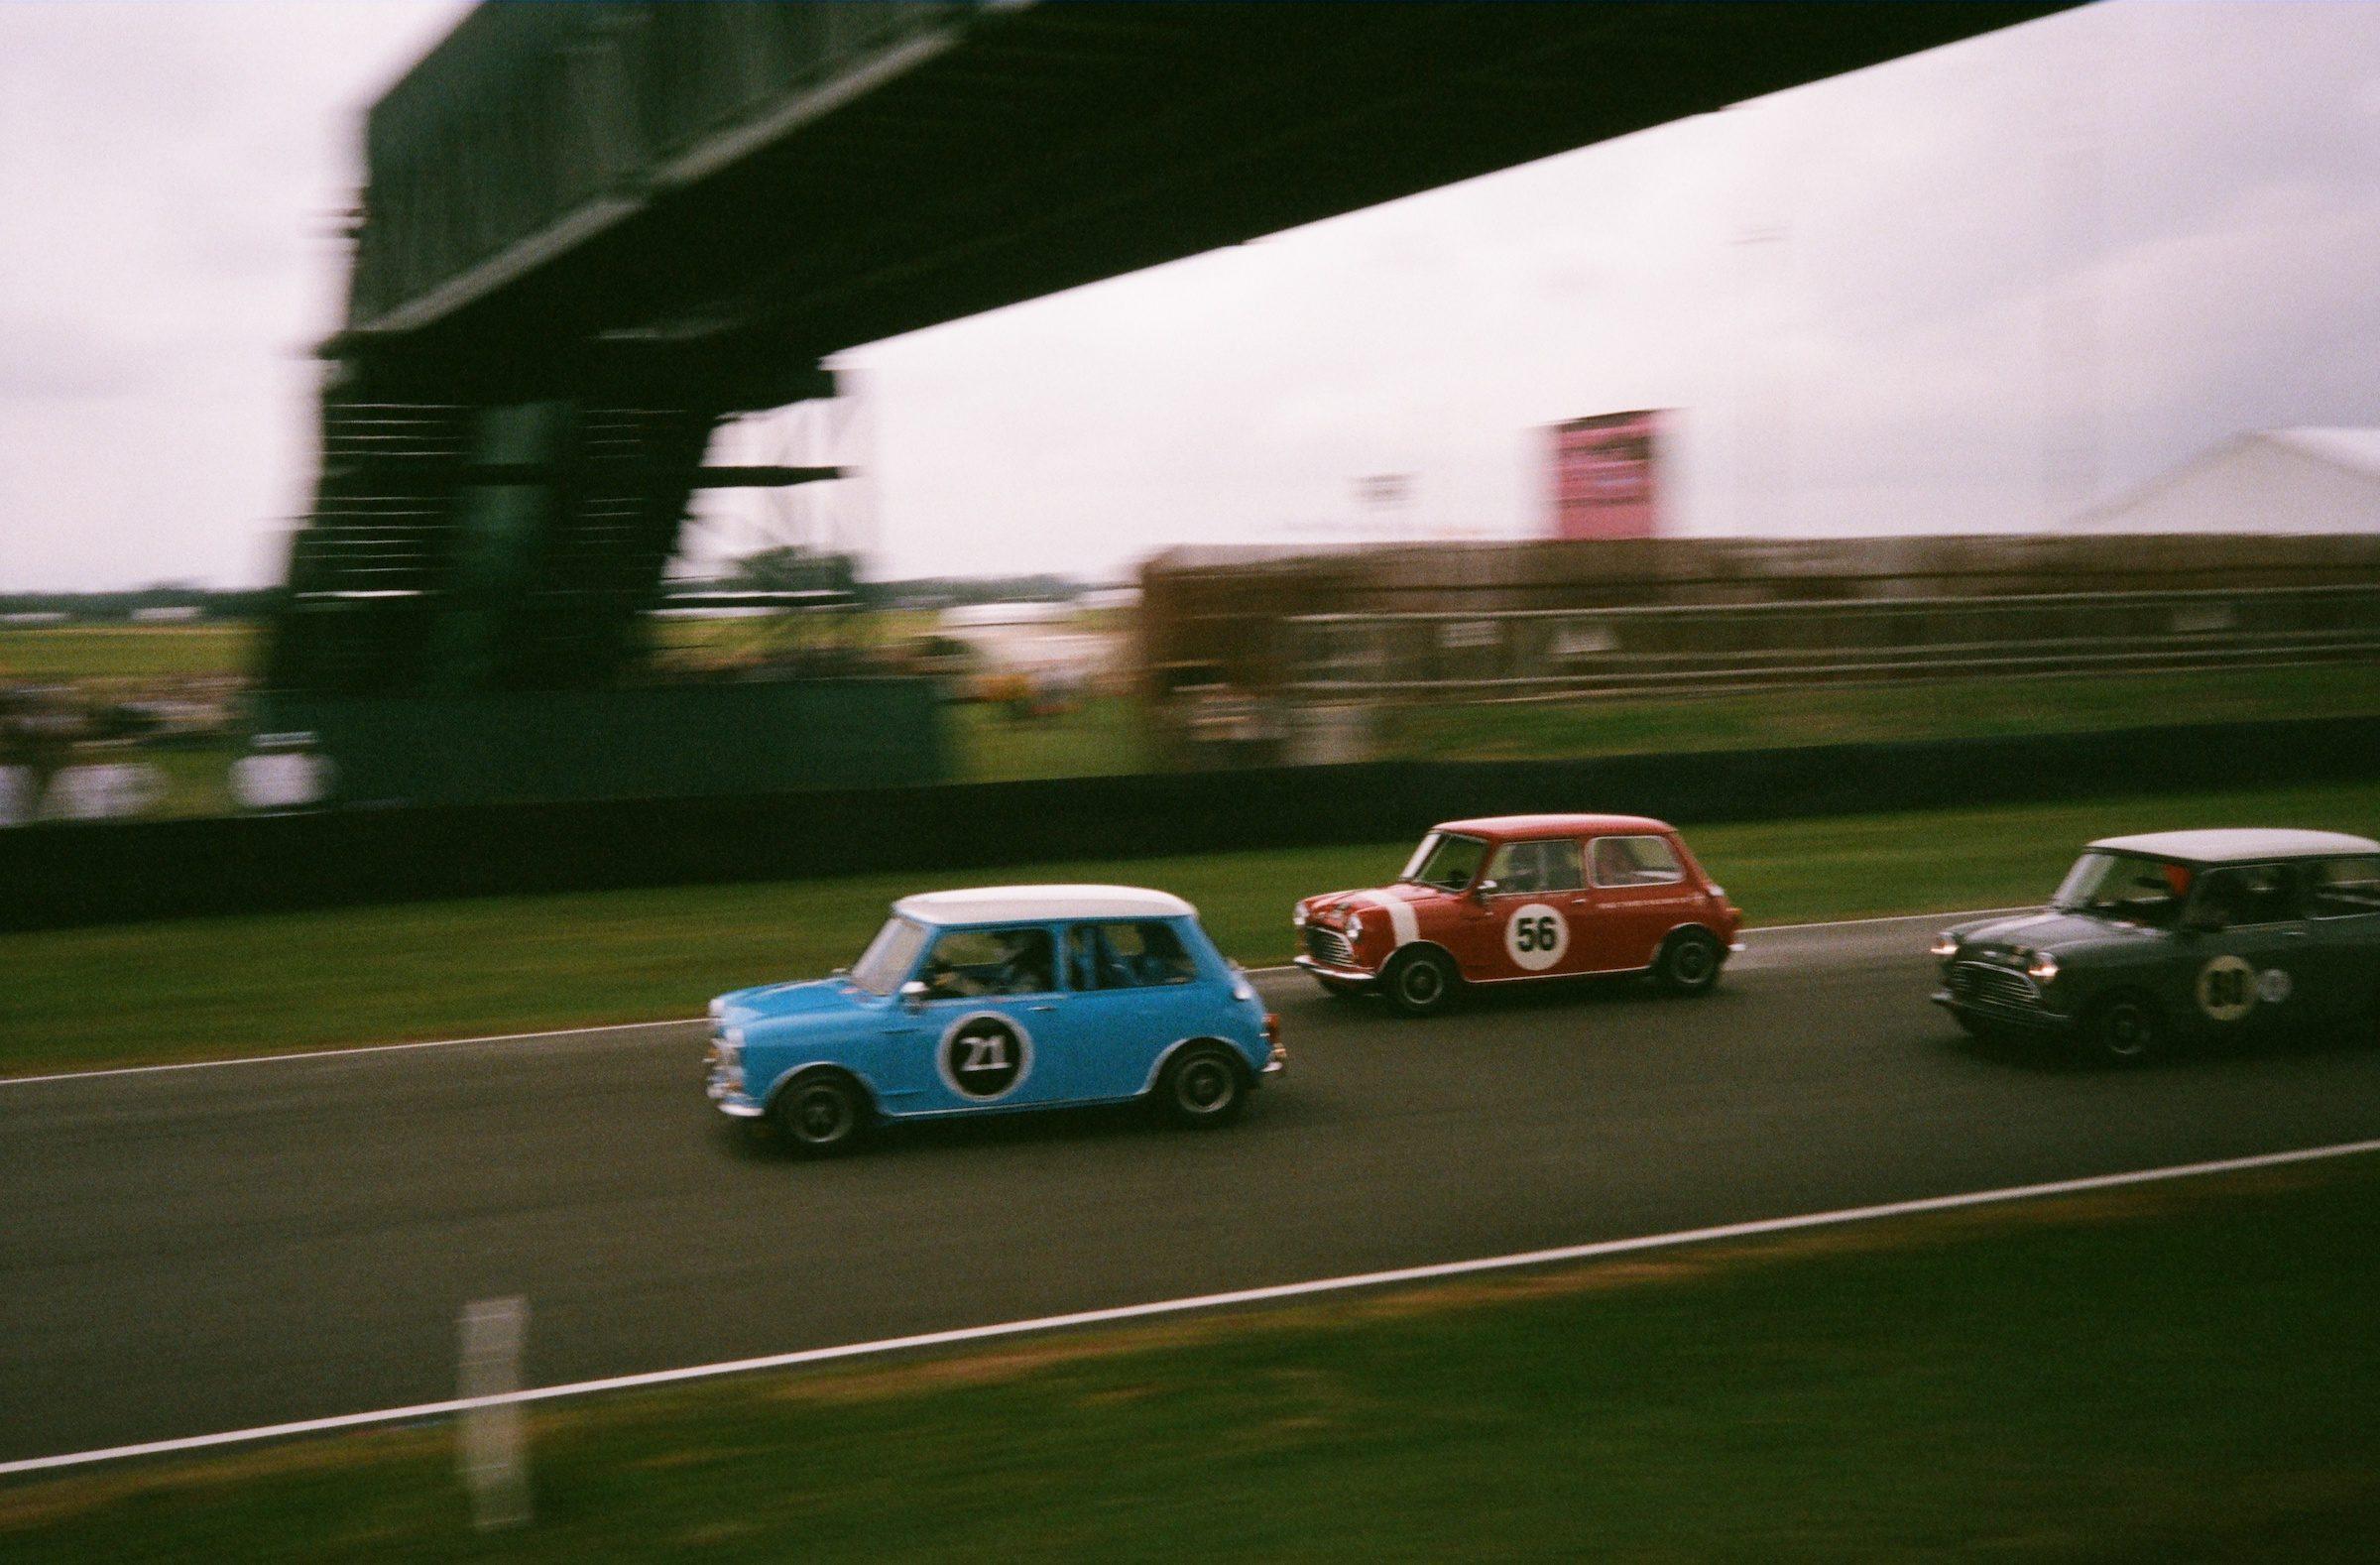 Goodwood Revival film mini racing action